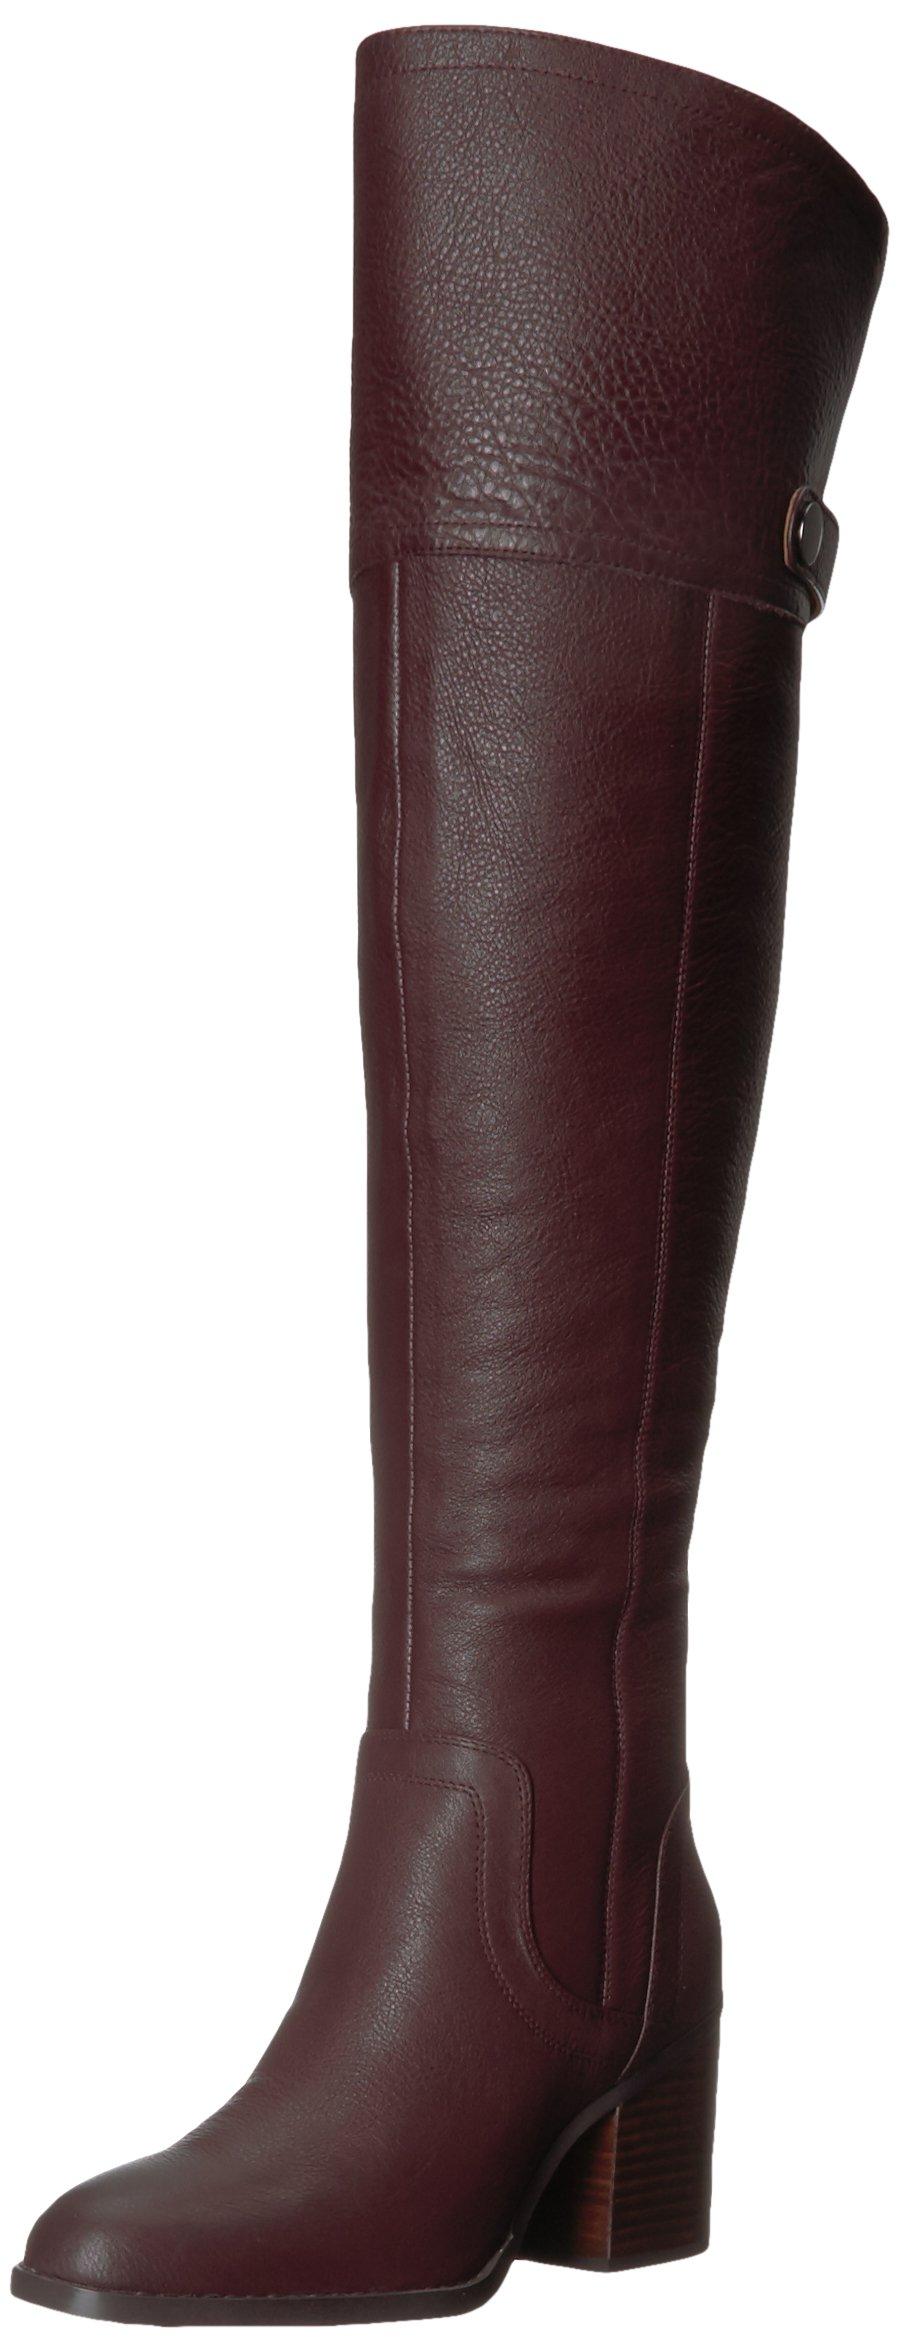 Franco Sarto Women's Ollie Over The Knee Boot, Dark Burgundy, 8.5 M US